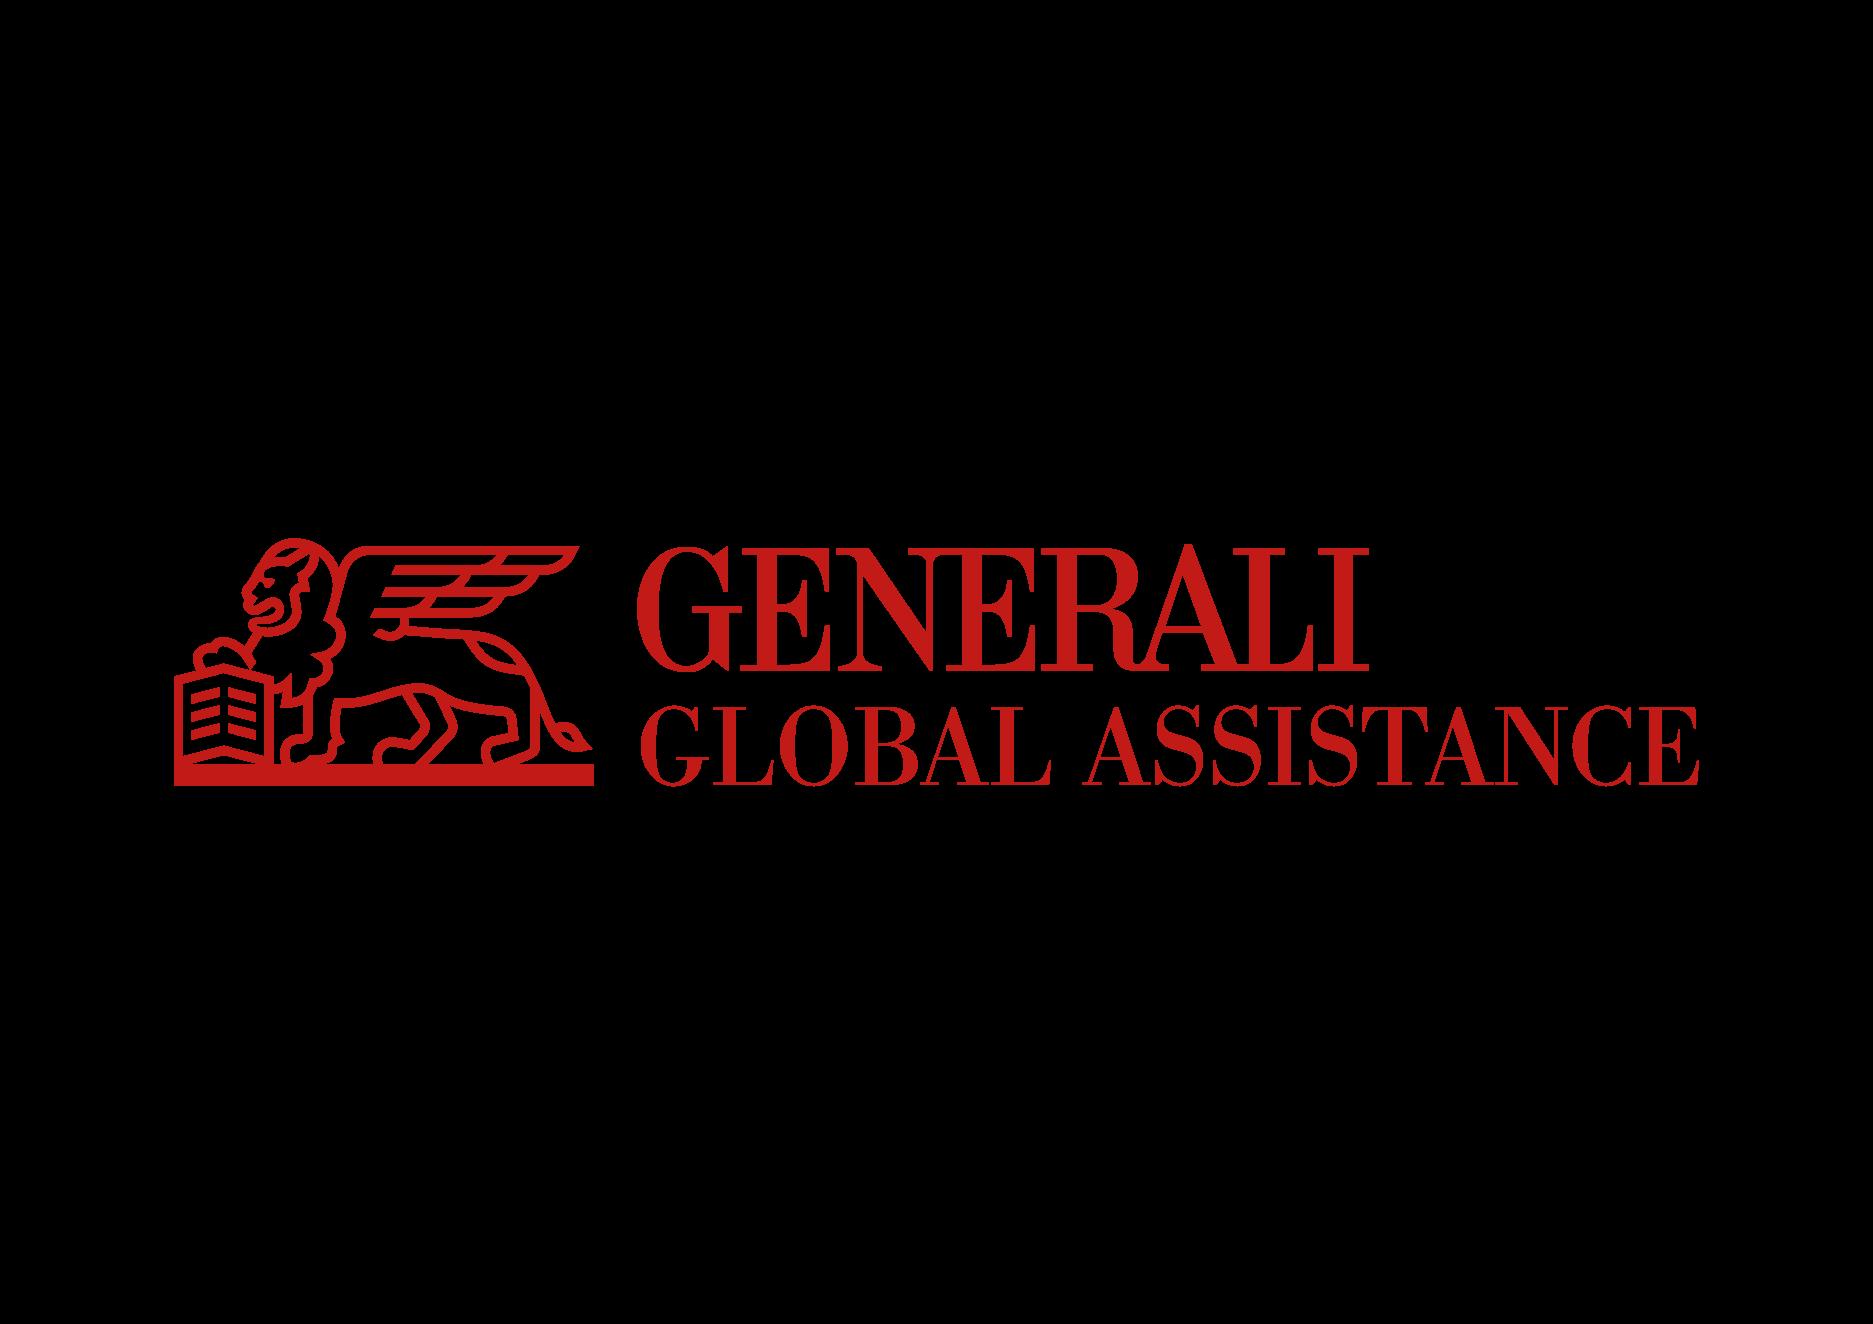 alt='Generali Global Assistance'  Title='Generali Global Assistance'